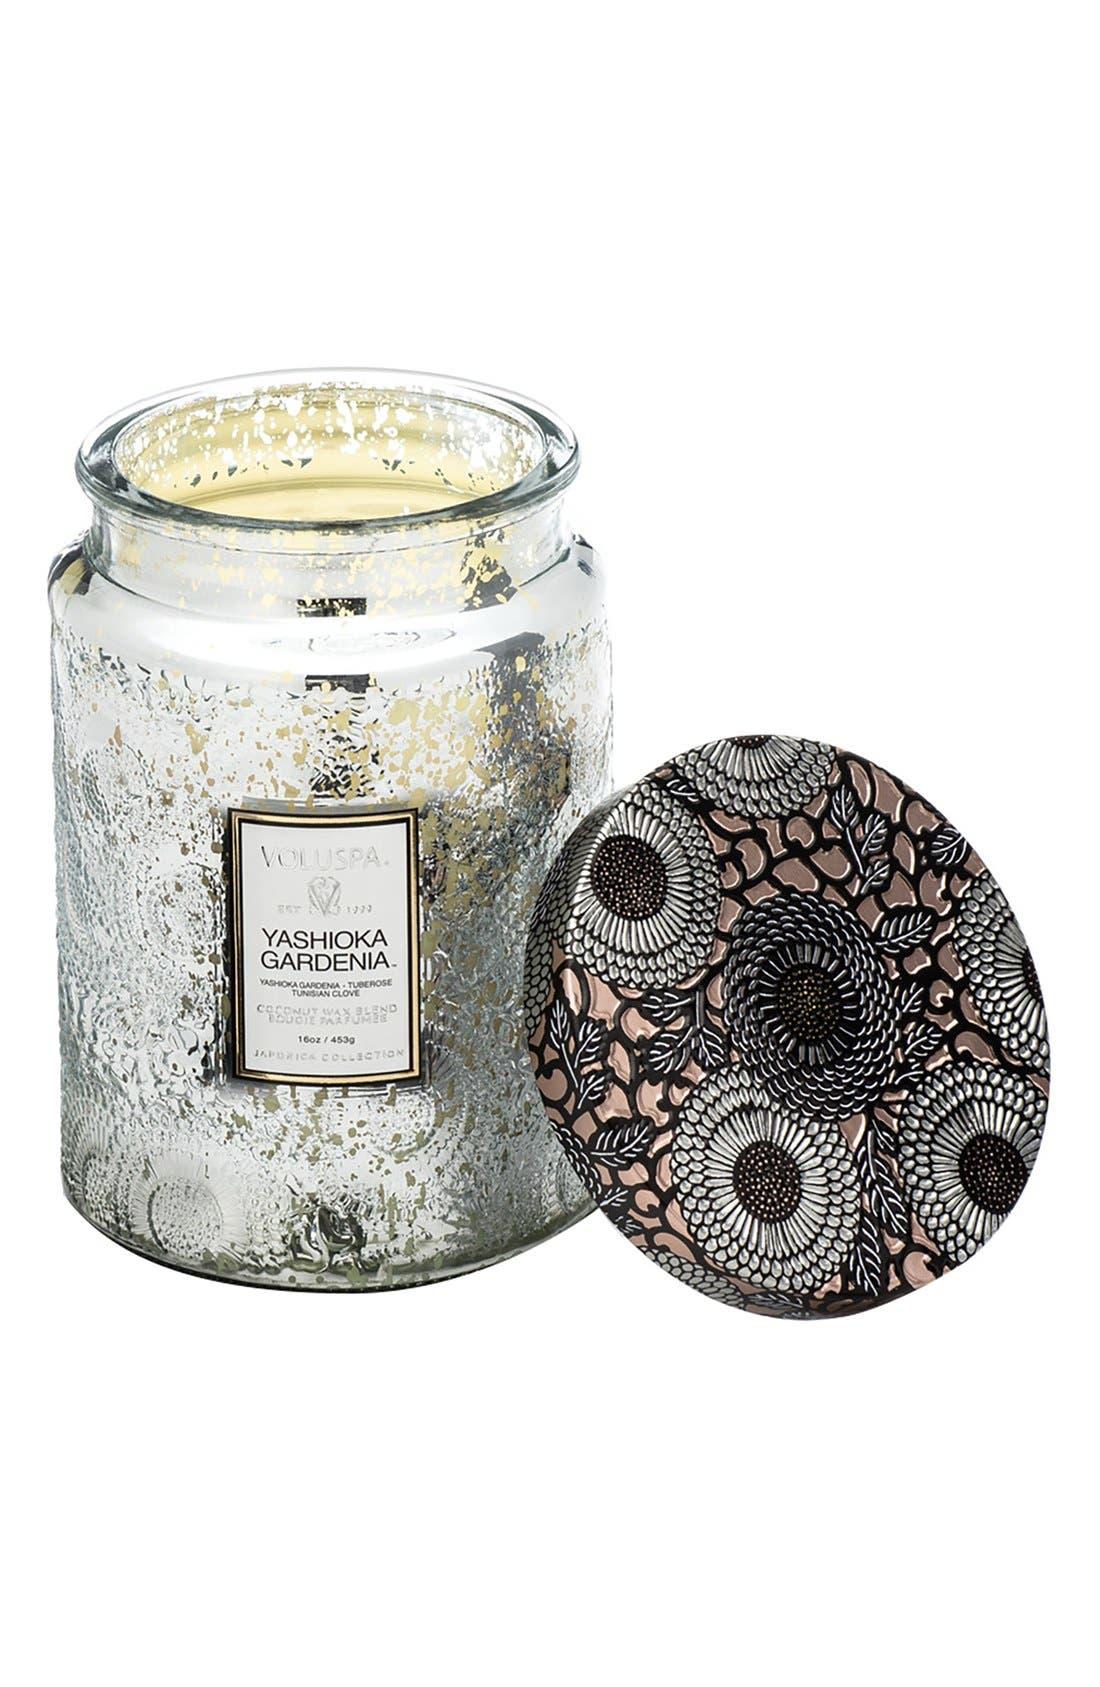 Main Image - Voluspa Japonica - Yashioka Gardenia Large Embossed Glass Jar Candle (Limited Edition)